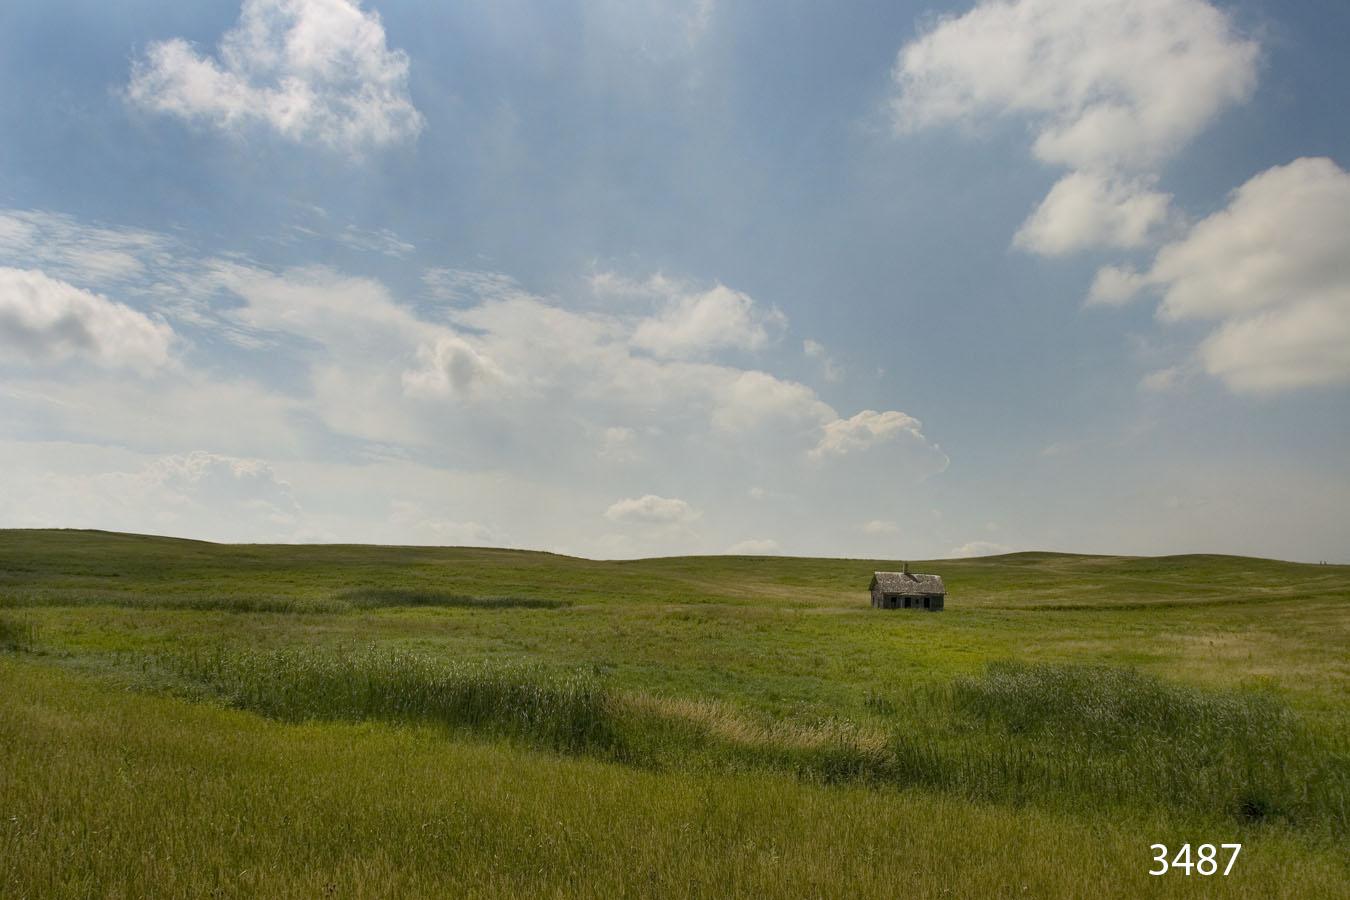 landscape grasses clouds cabin field midwest